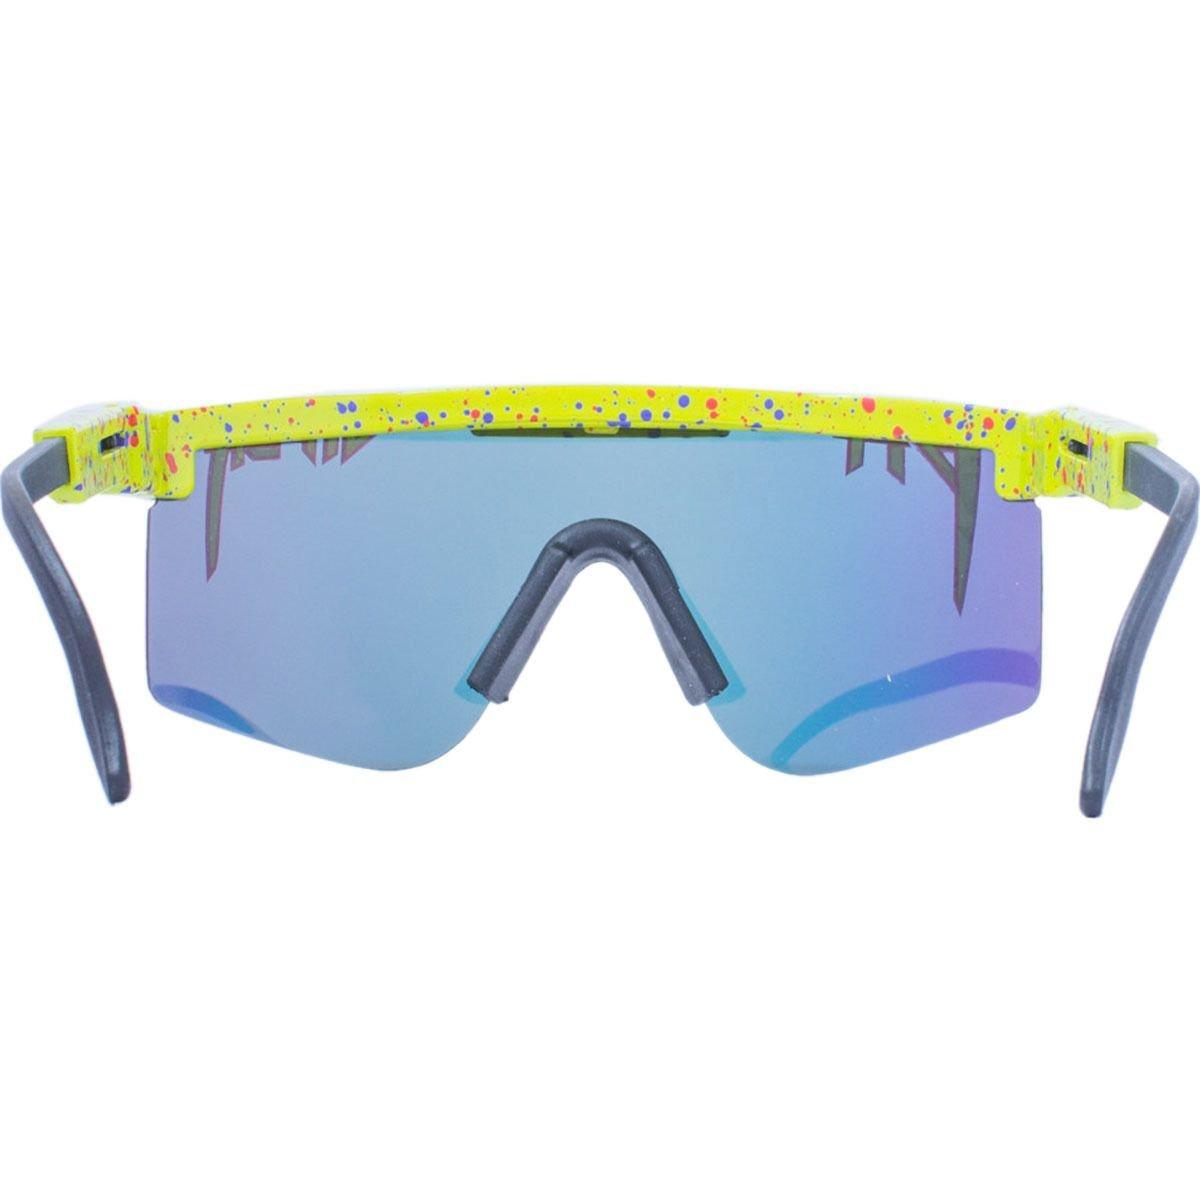 853329f714 Pit Viper Pit Viper Sunglasses Polarized 1993 Rainbow One Size